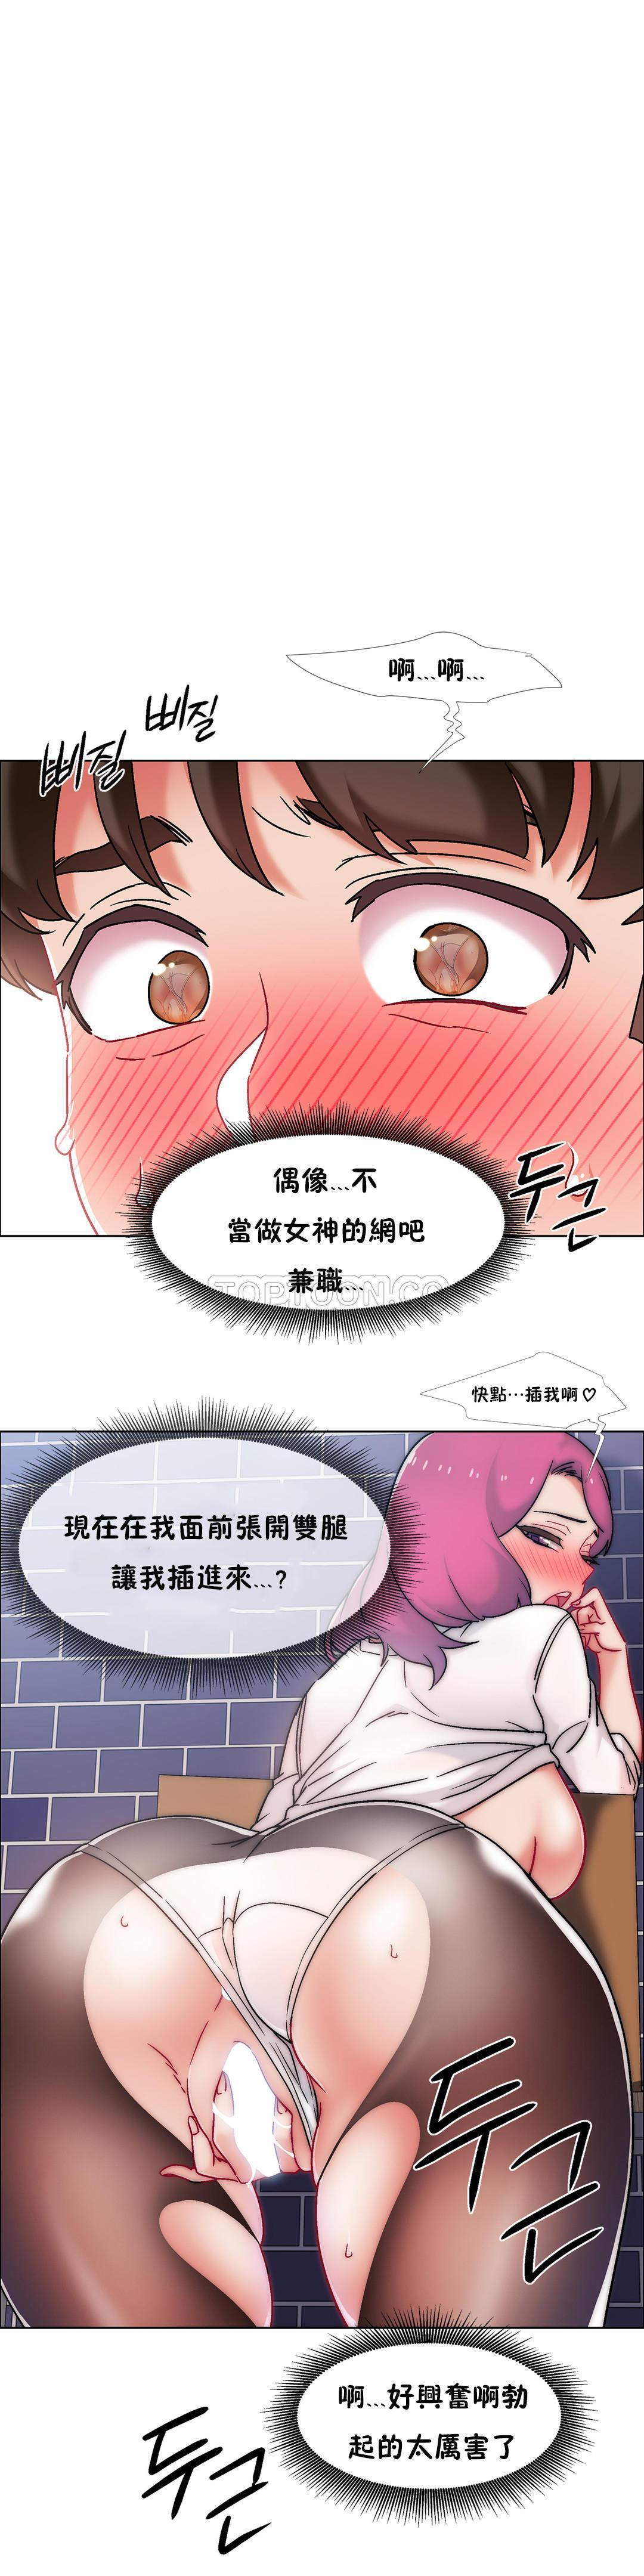 [Studio Wannabe] Rental Girls | 出租女郎 Ch. 33-58 [Chinese]  第二季 完结 184